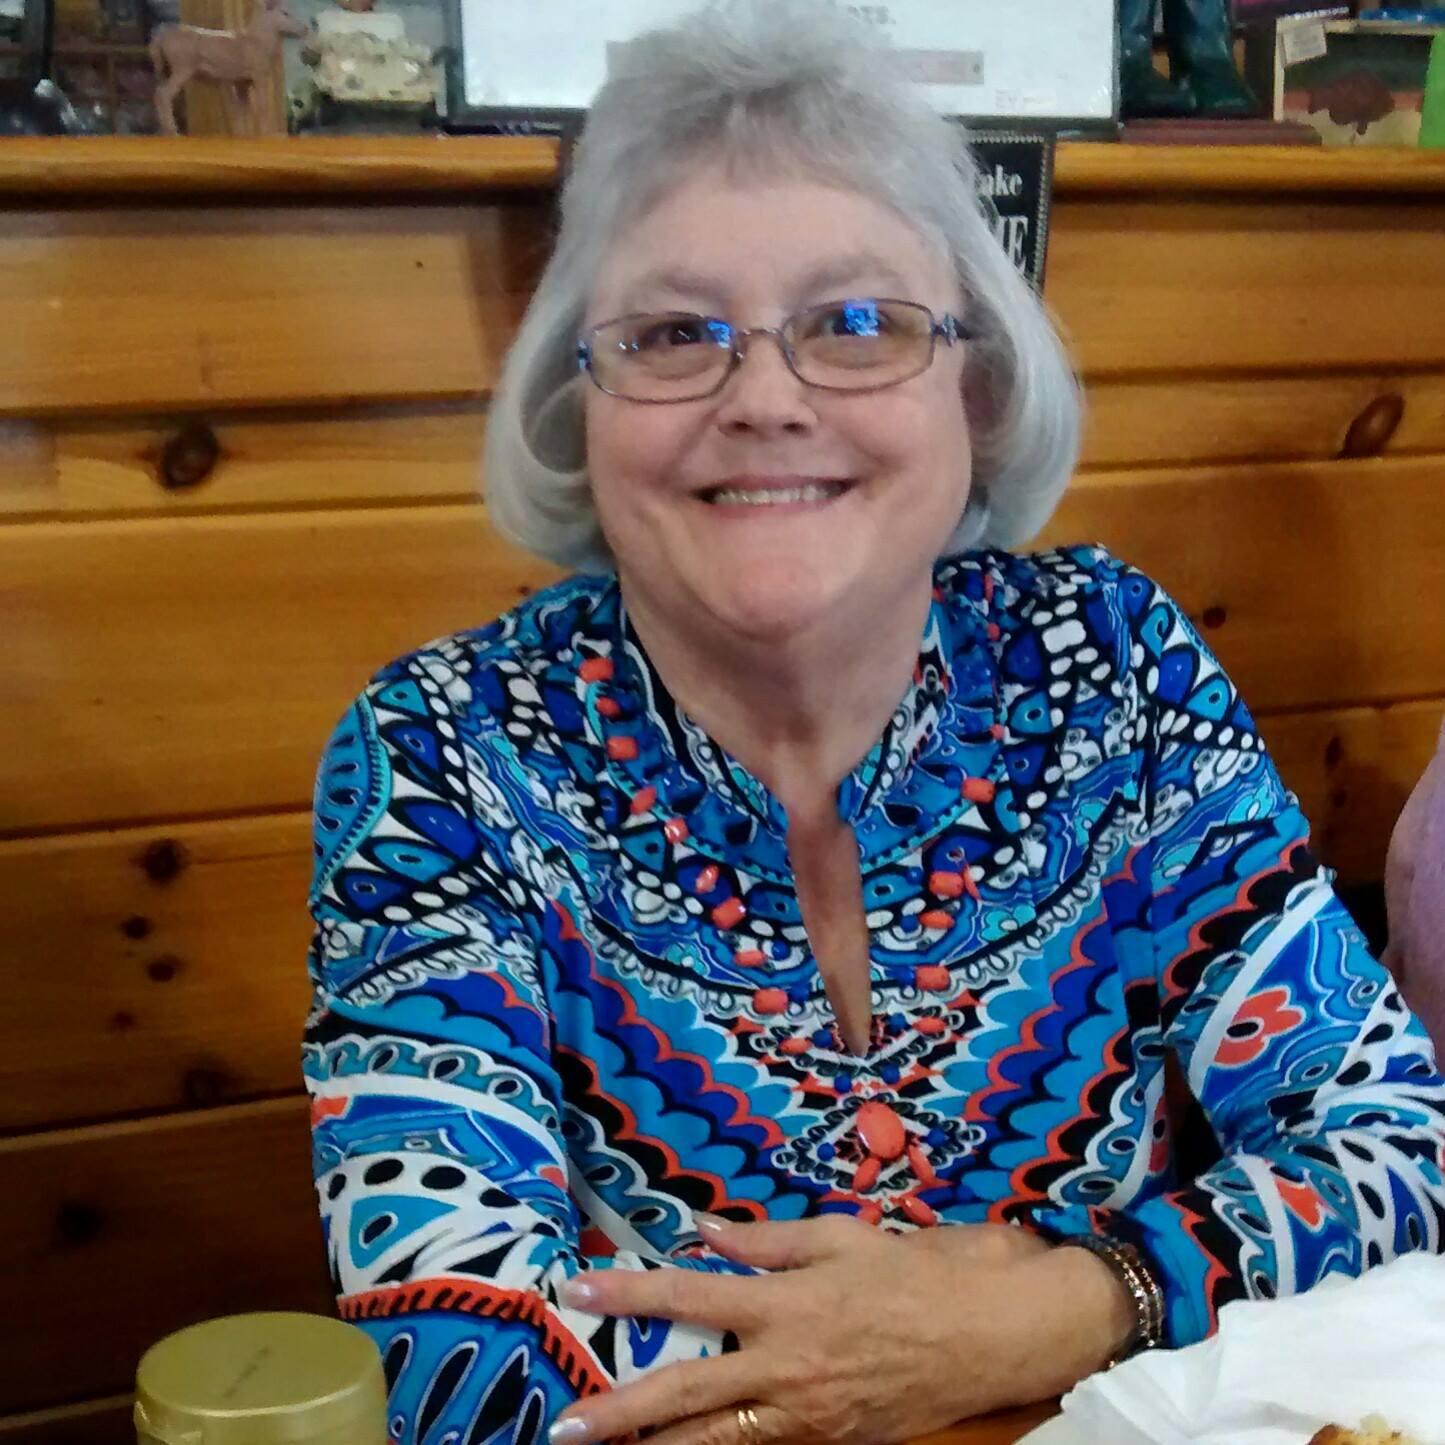 Joanne Pittman